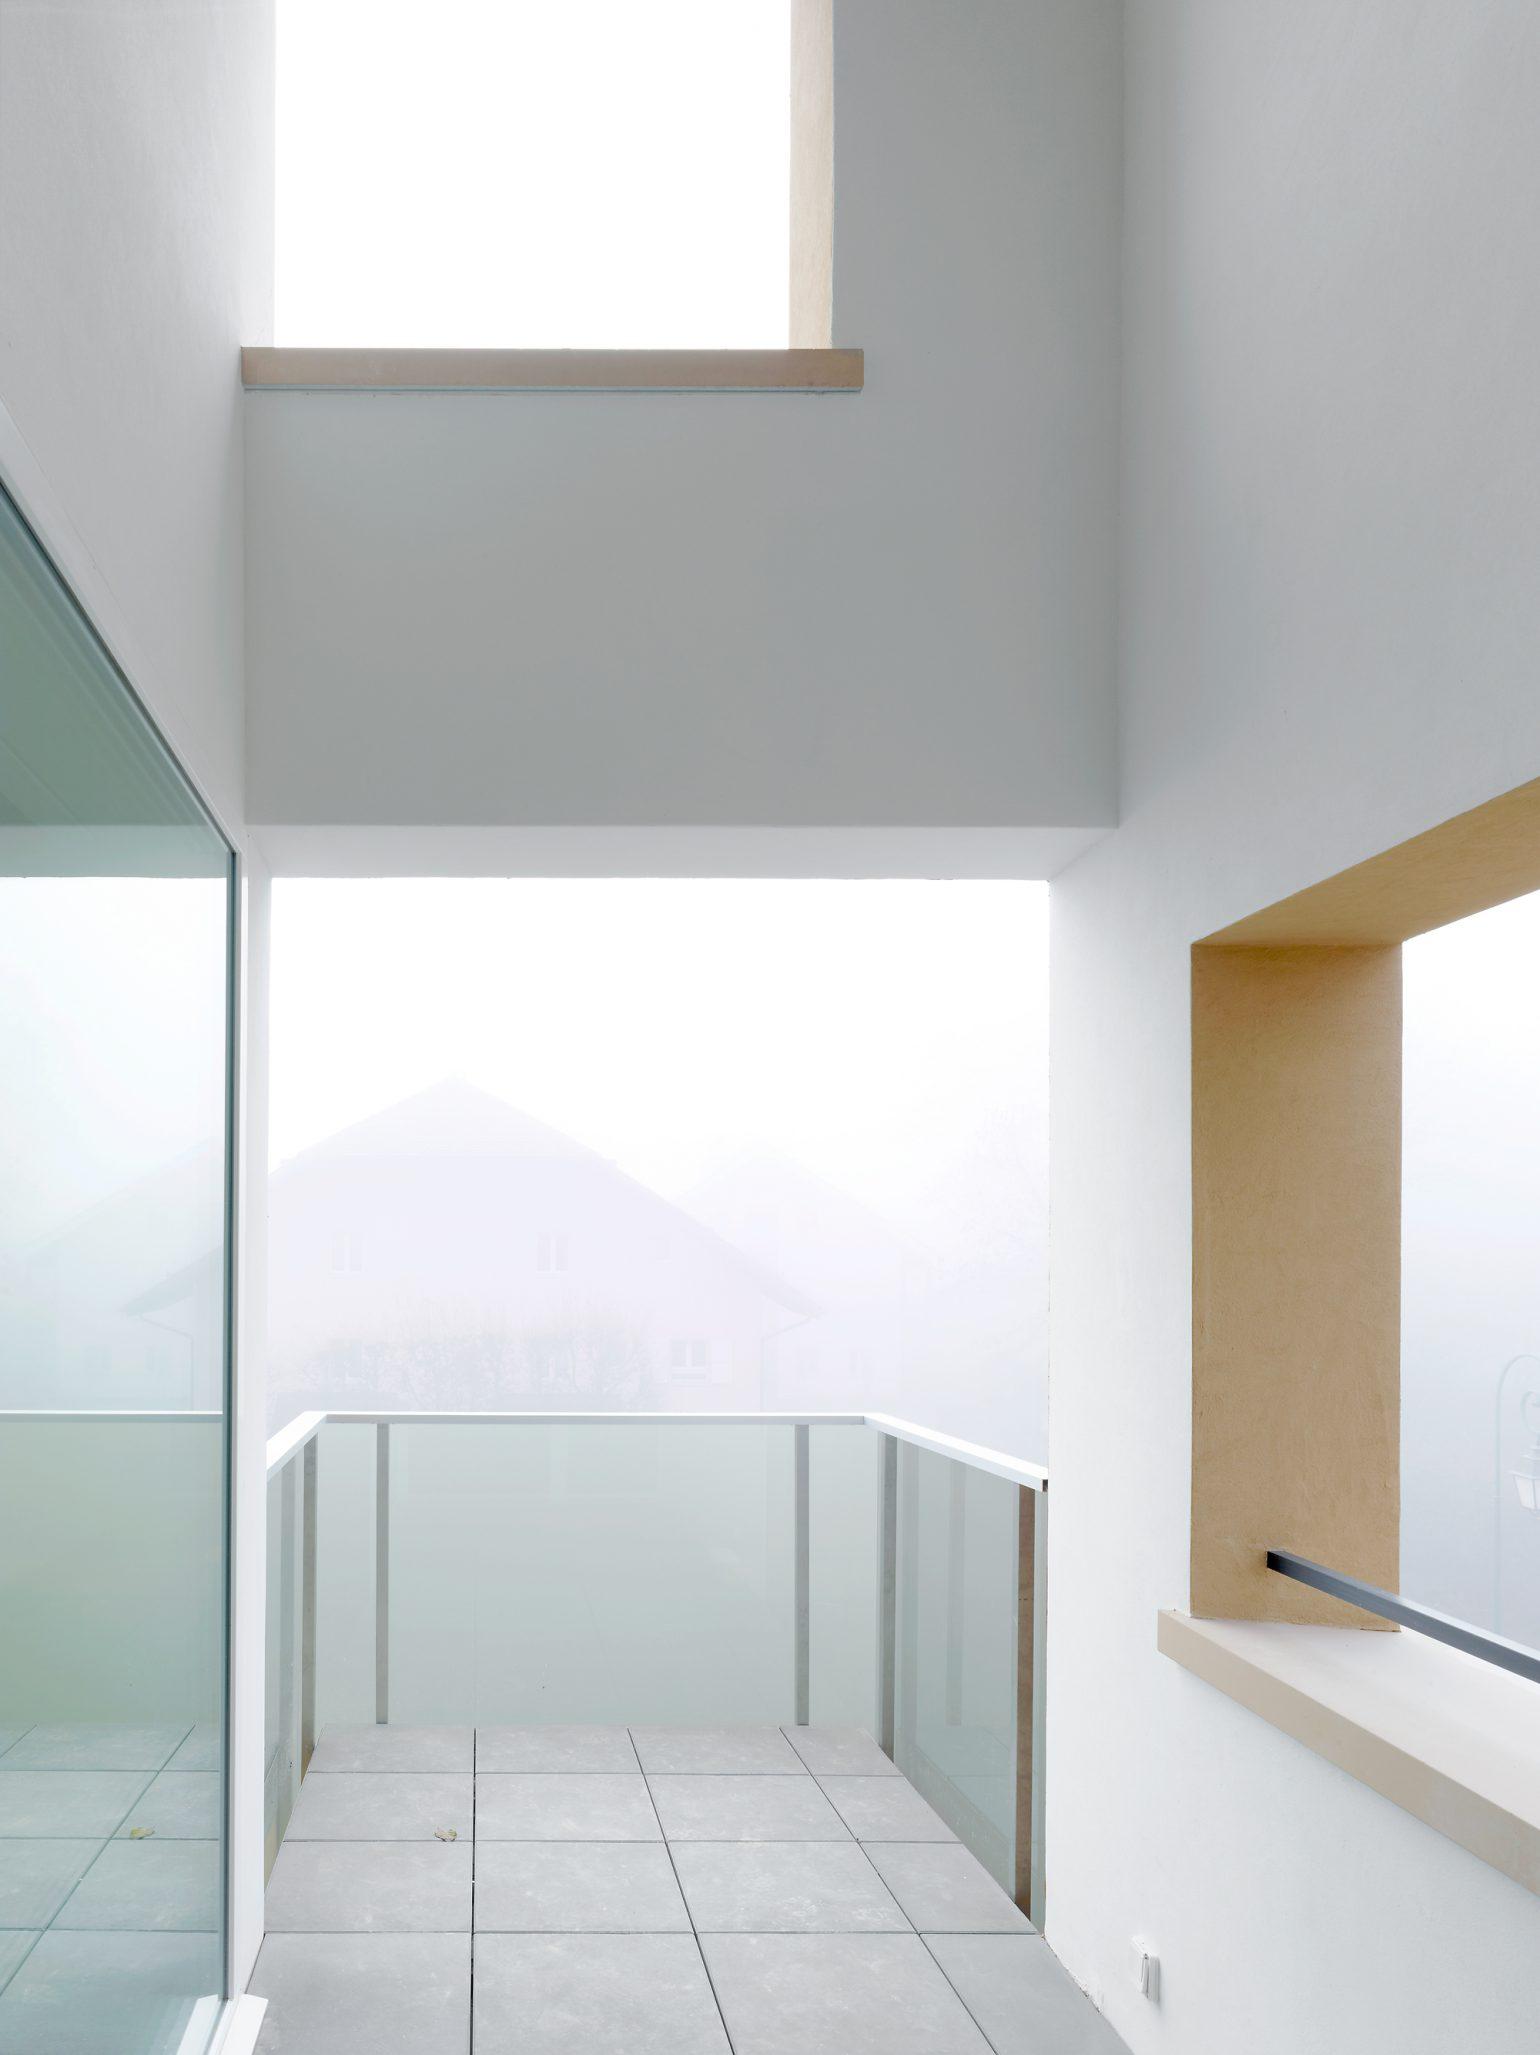 immeuble_habitation_genolier_meyer_achitecture_sion_12